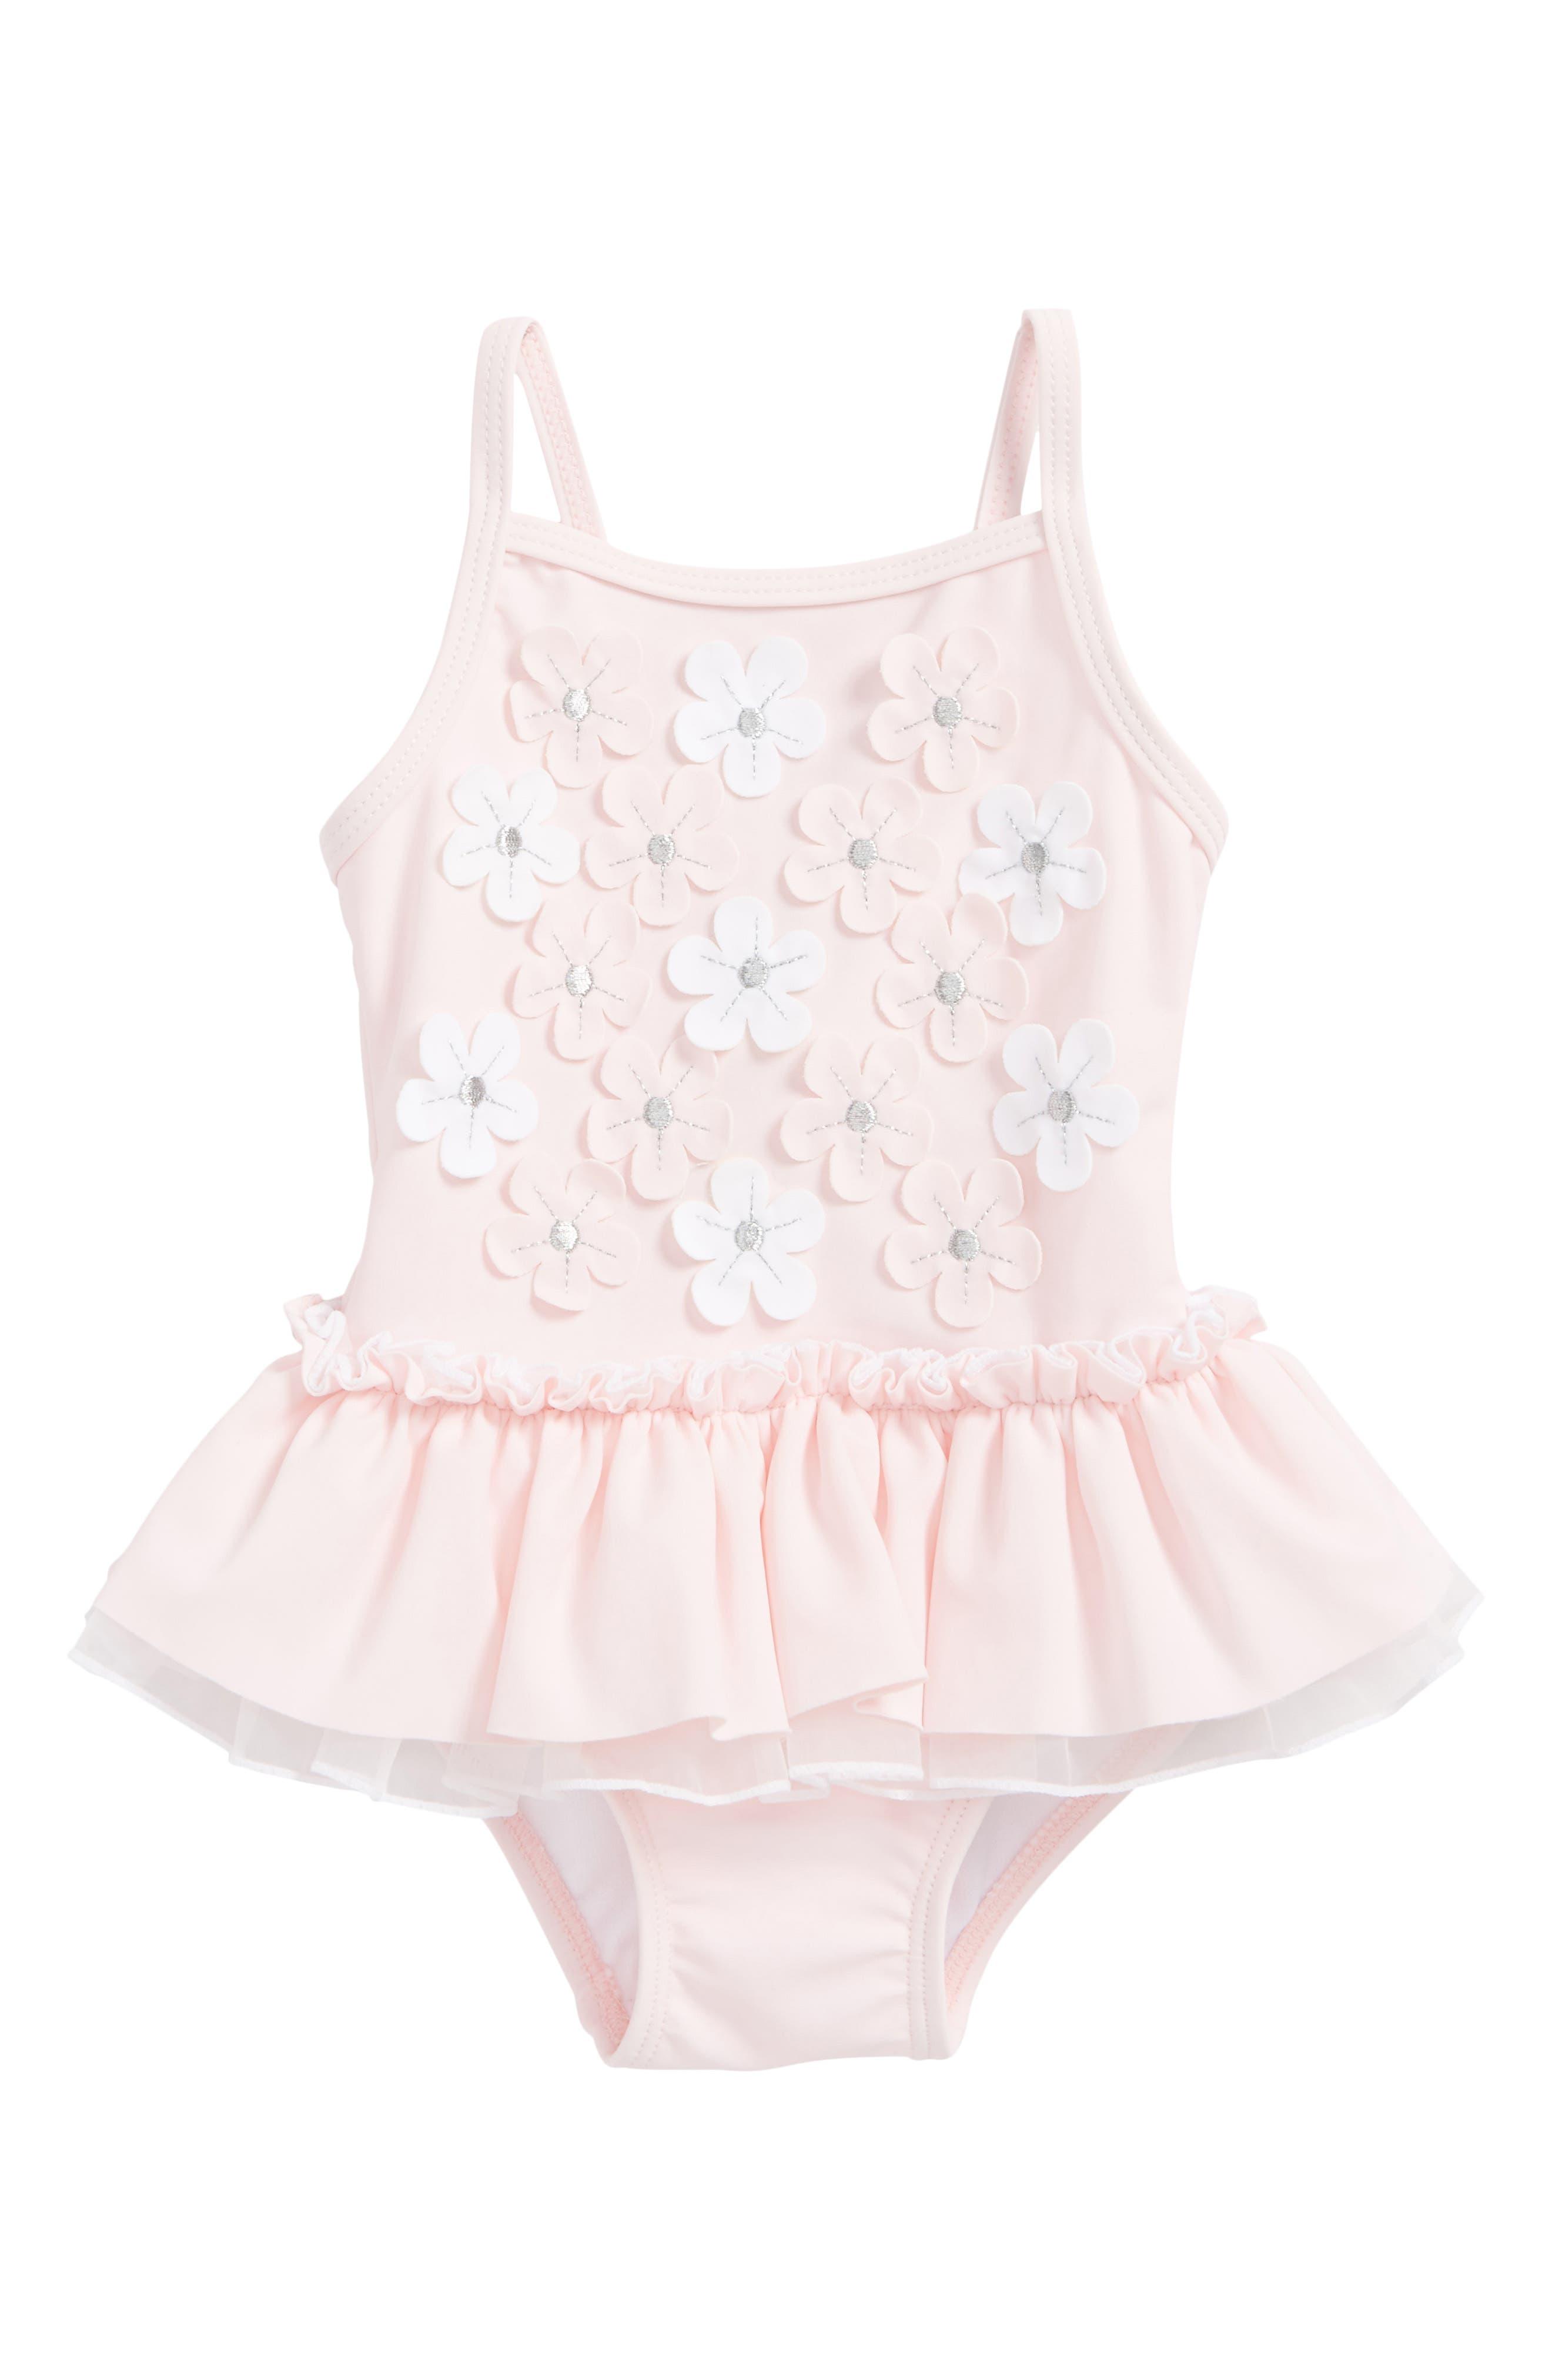 Main Image - Little Me Floral Appliqué One-Piece Swimsuit (Baby Girls)